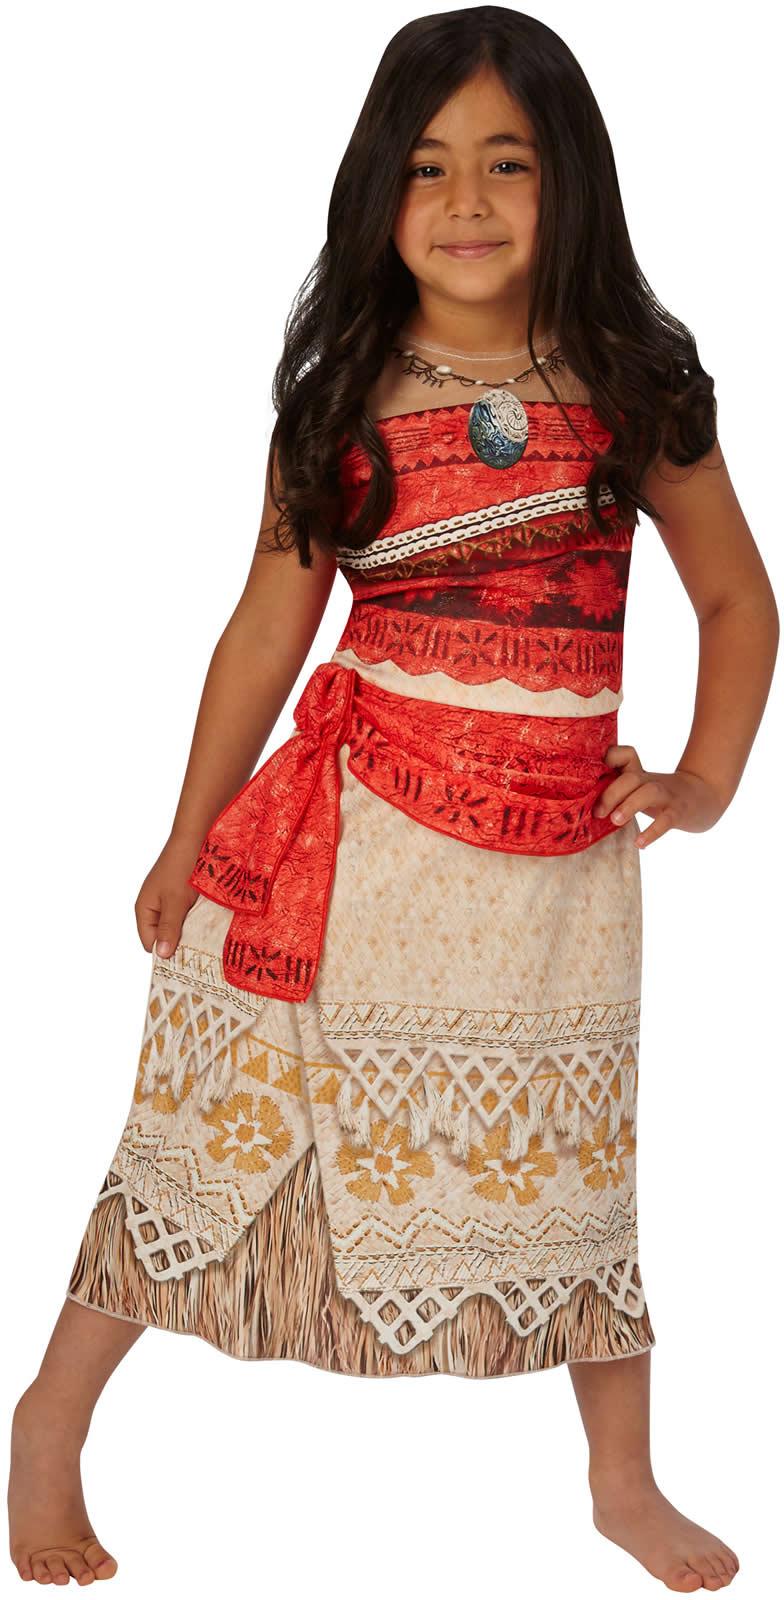 Vaiana Disney Häuptlingstochter Prinzessin Kinder Karneval Kostüm   eBay